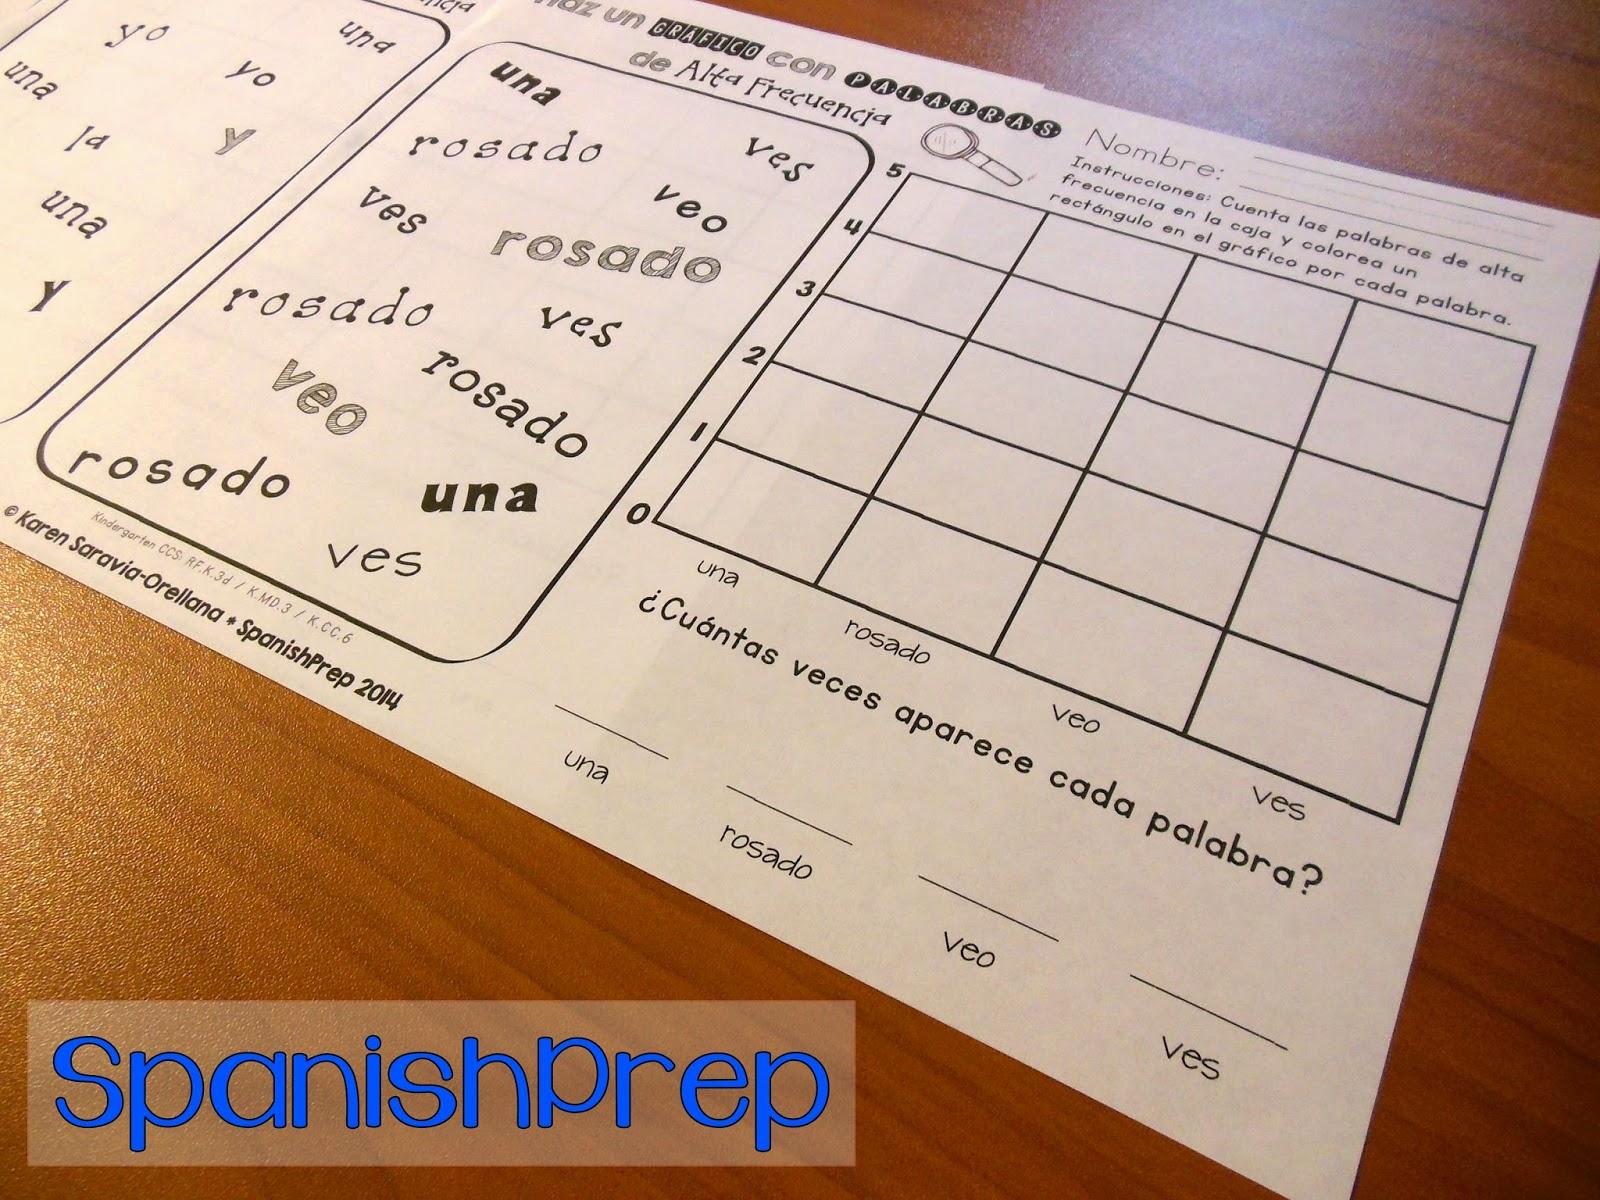 Spanishprep Blog Graphing Spanish Pre K Sight Words